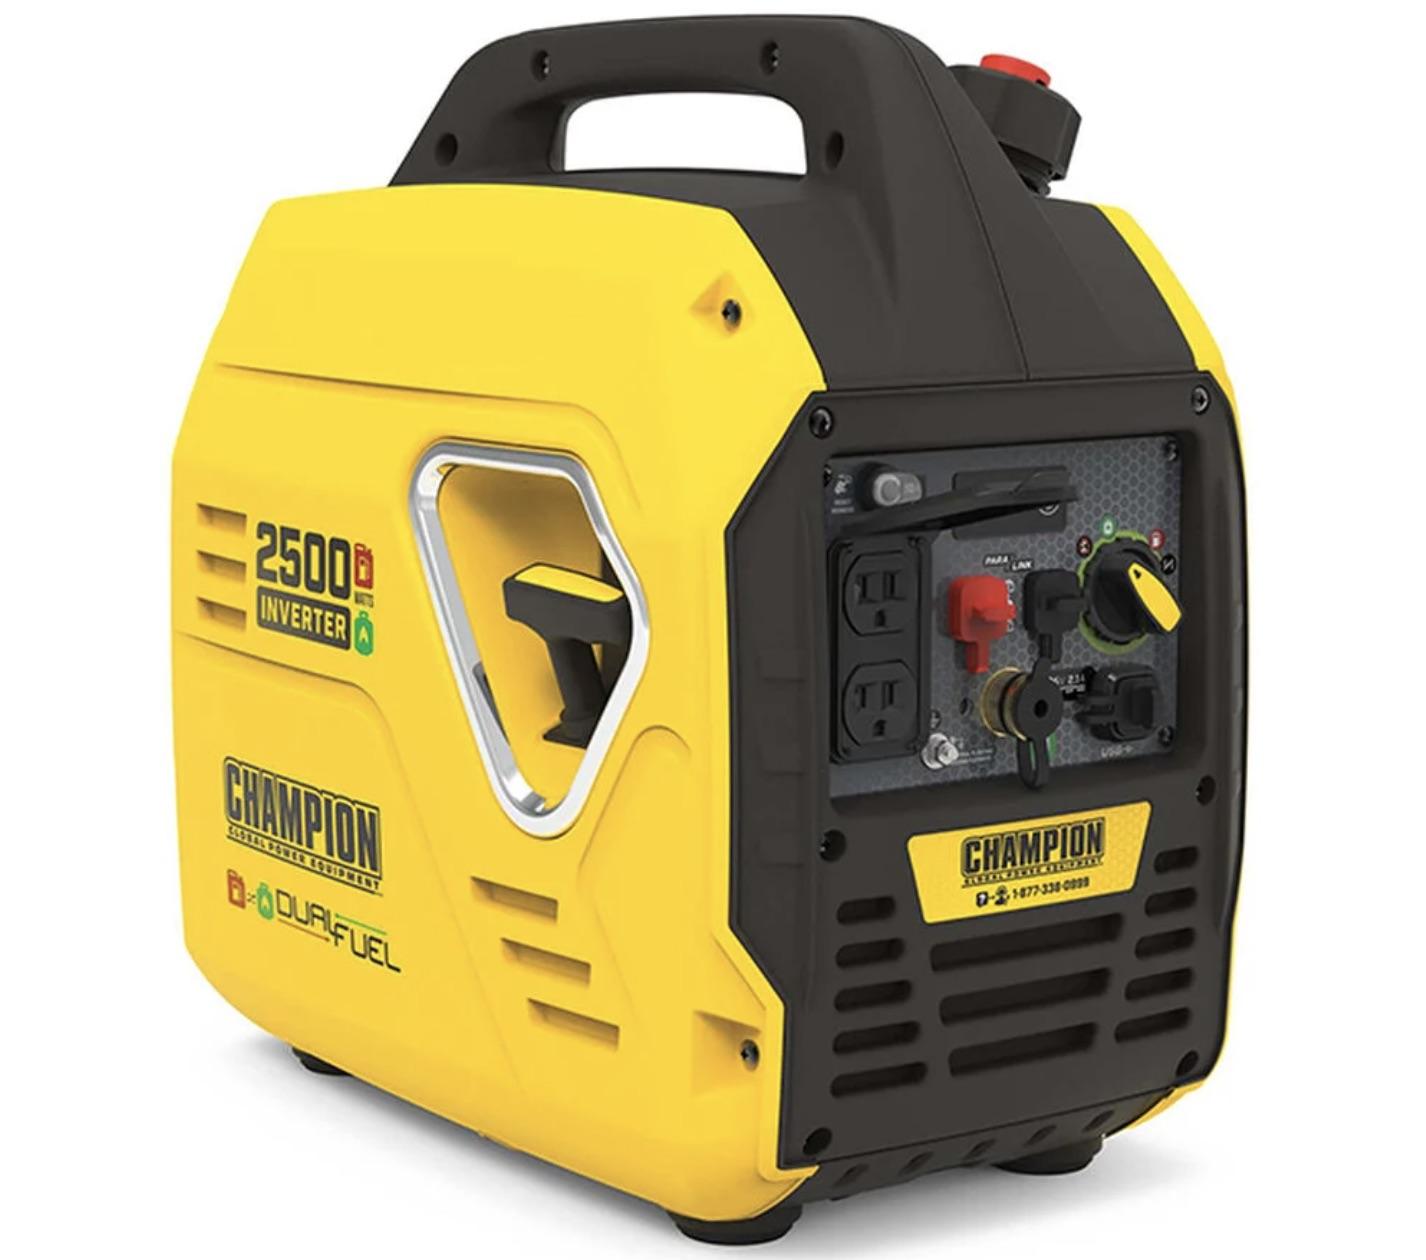 Champion 2500 inverter portable generator